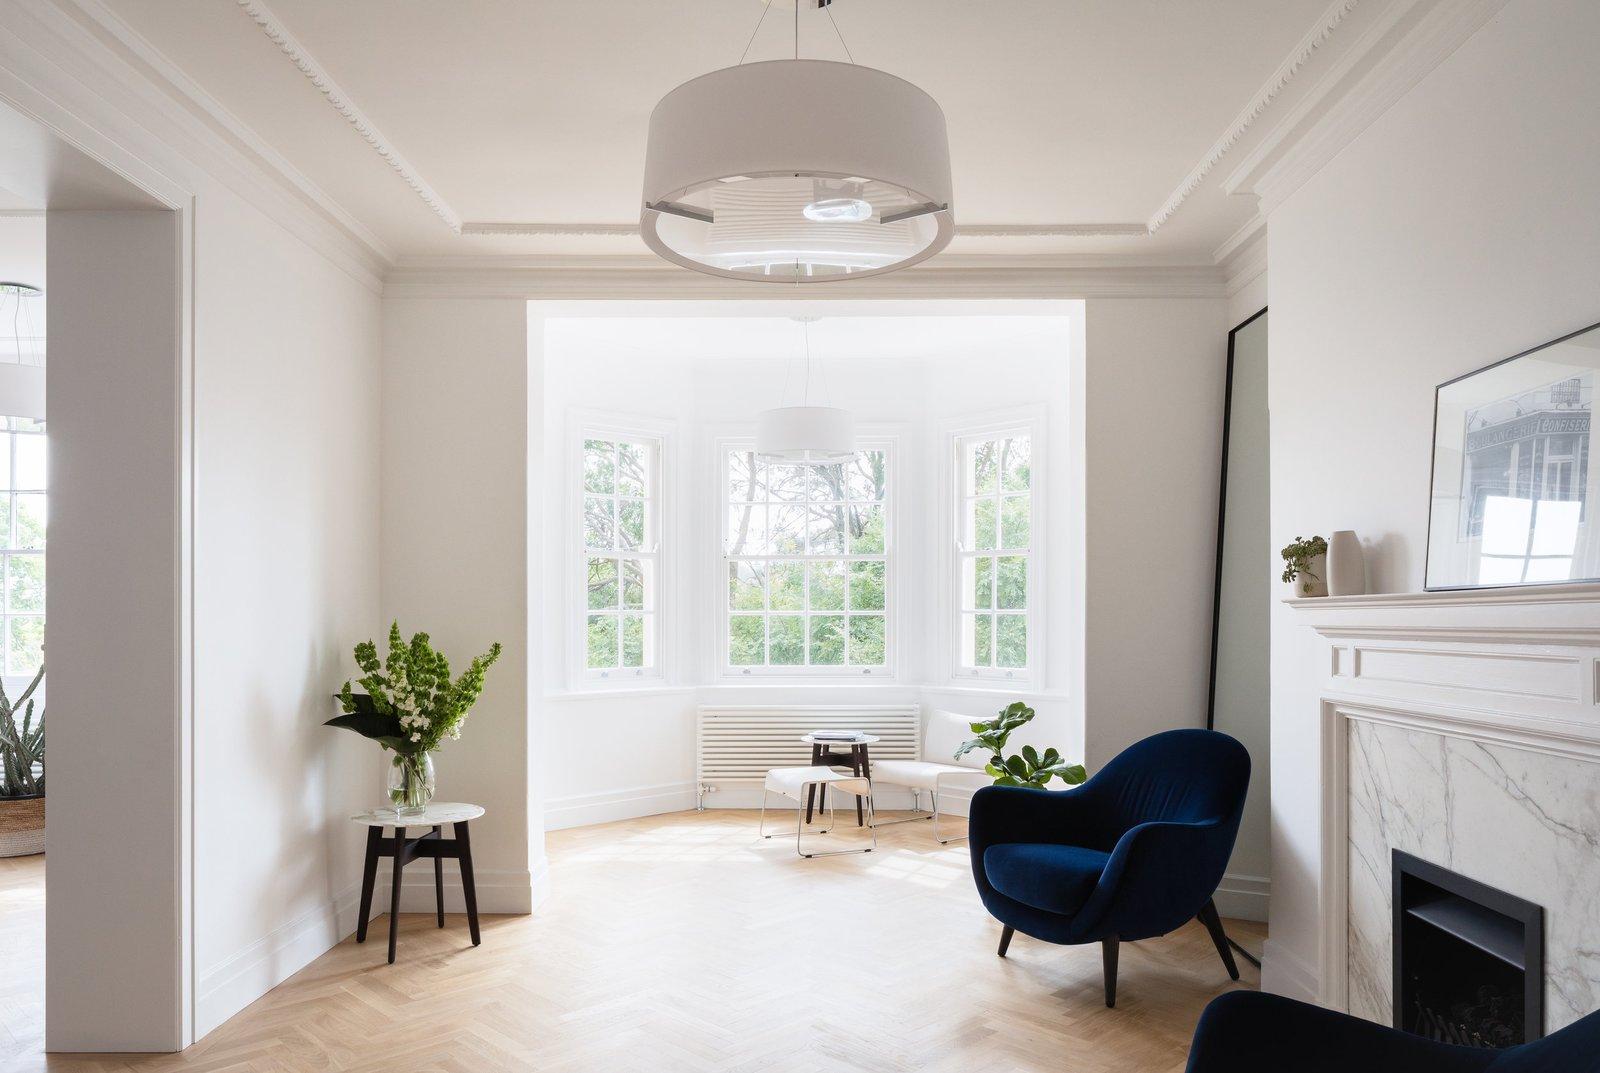 Living Room, Coffee Tables, Chair, Light Hardwood Floor, Pendant Lighting, and Wood Burning Fireplace Living room  K Apartment